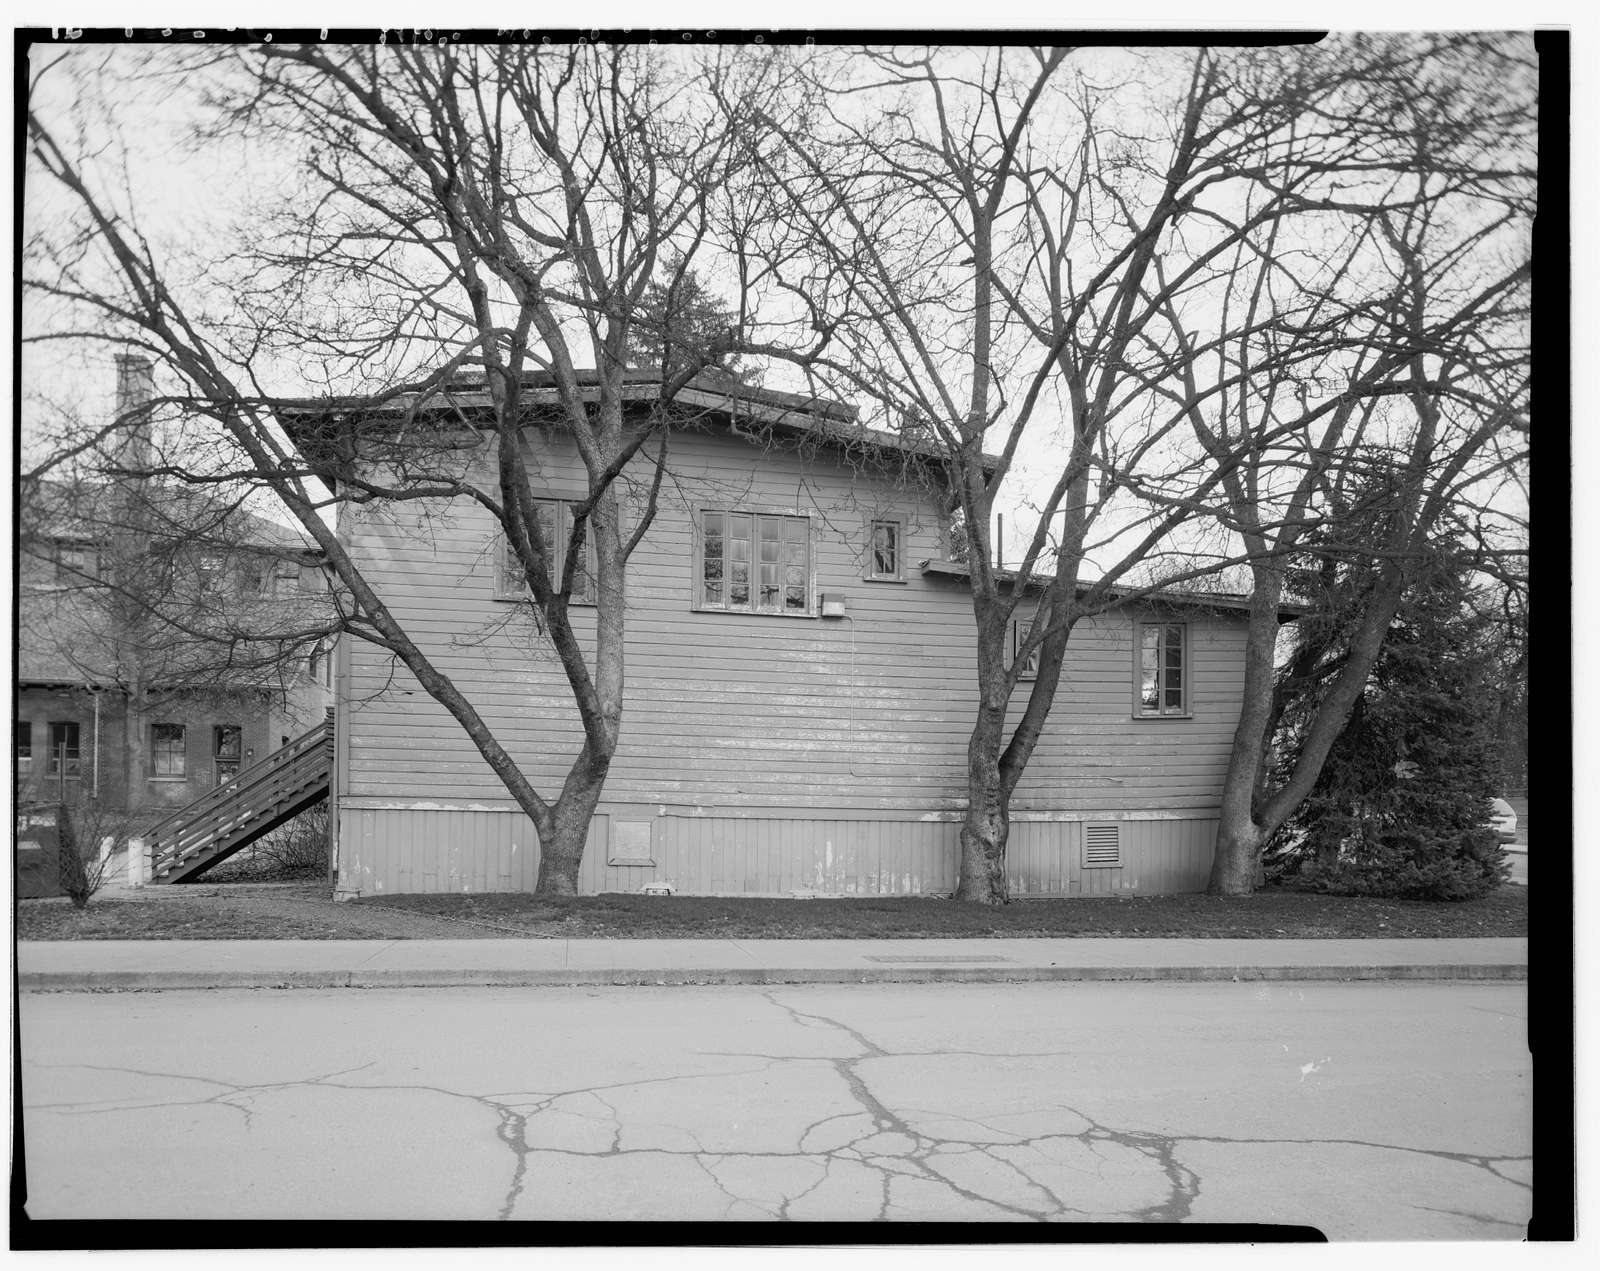 University of Idaho, YMCA Hut, Northeast corner of University Avenue & Line Street, Moscow, Latah County, ID